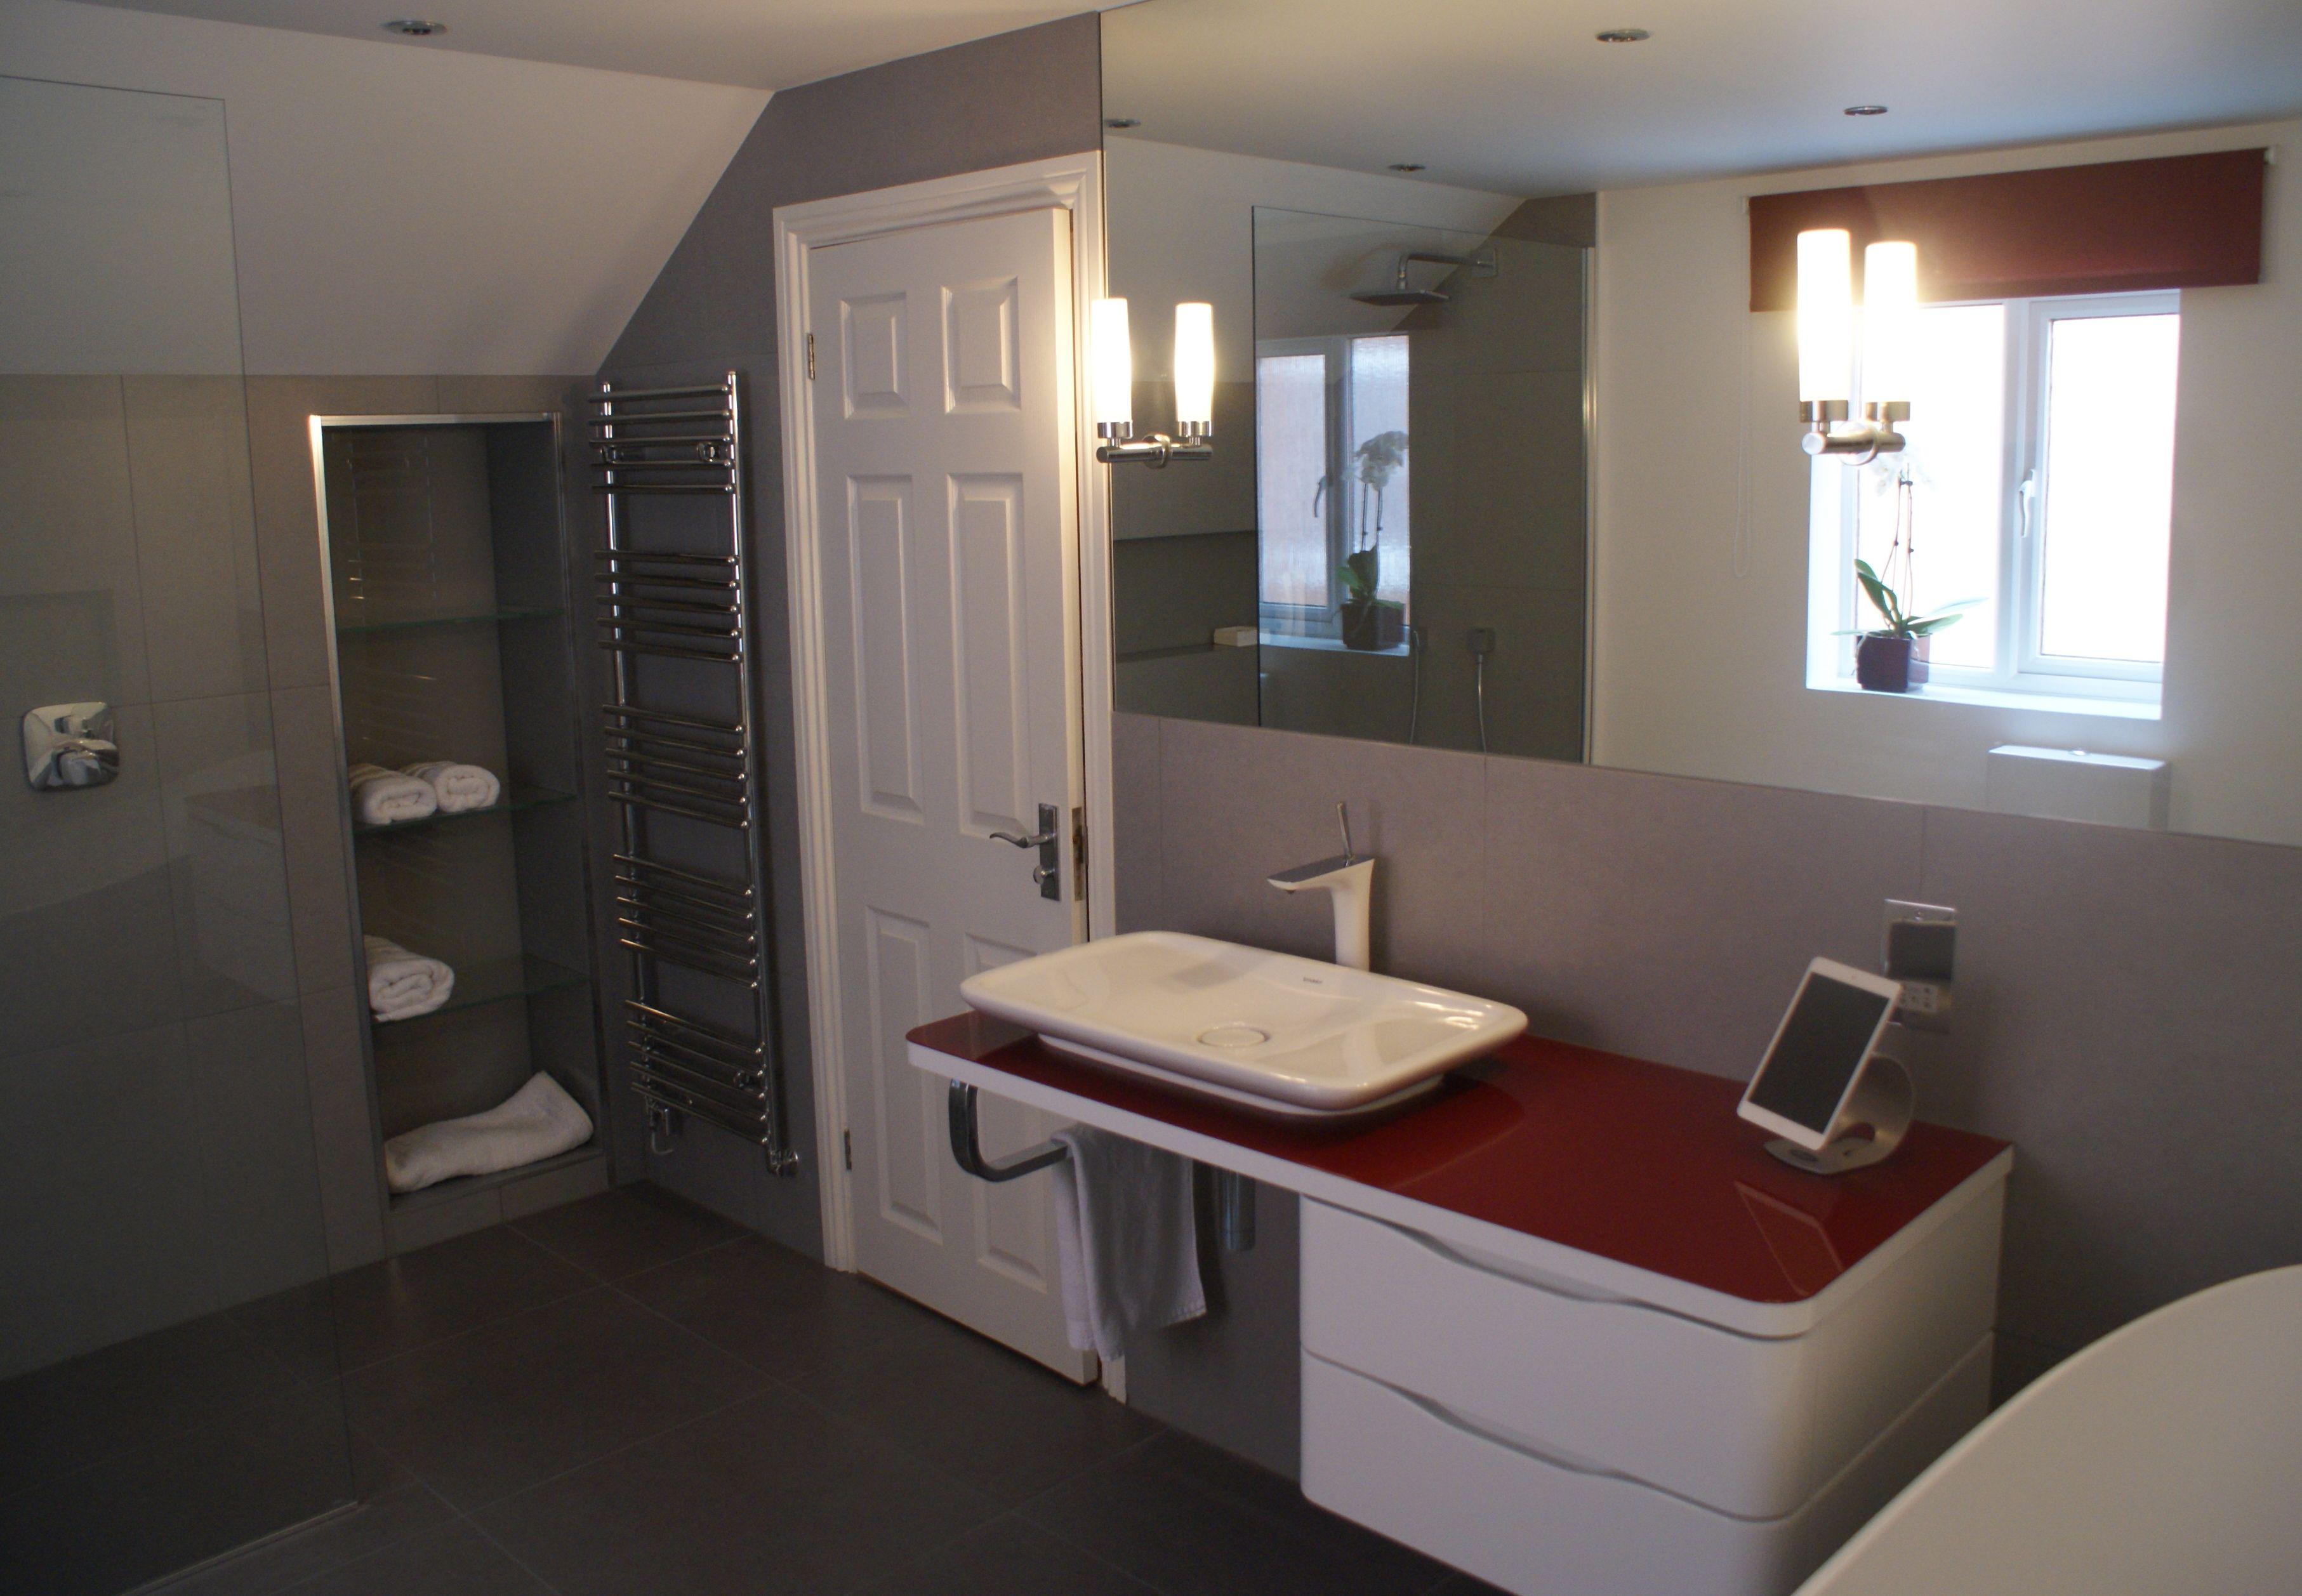 Duravit Puravida Console in White Red gloss Bathroom designed